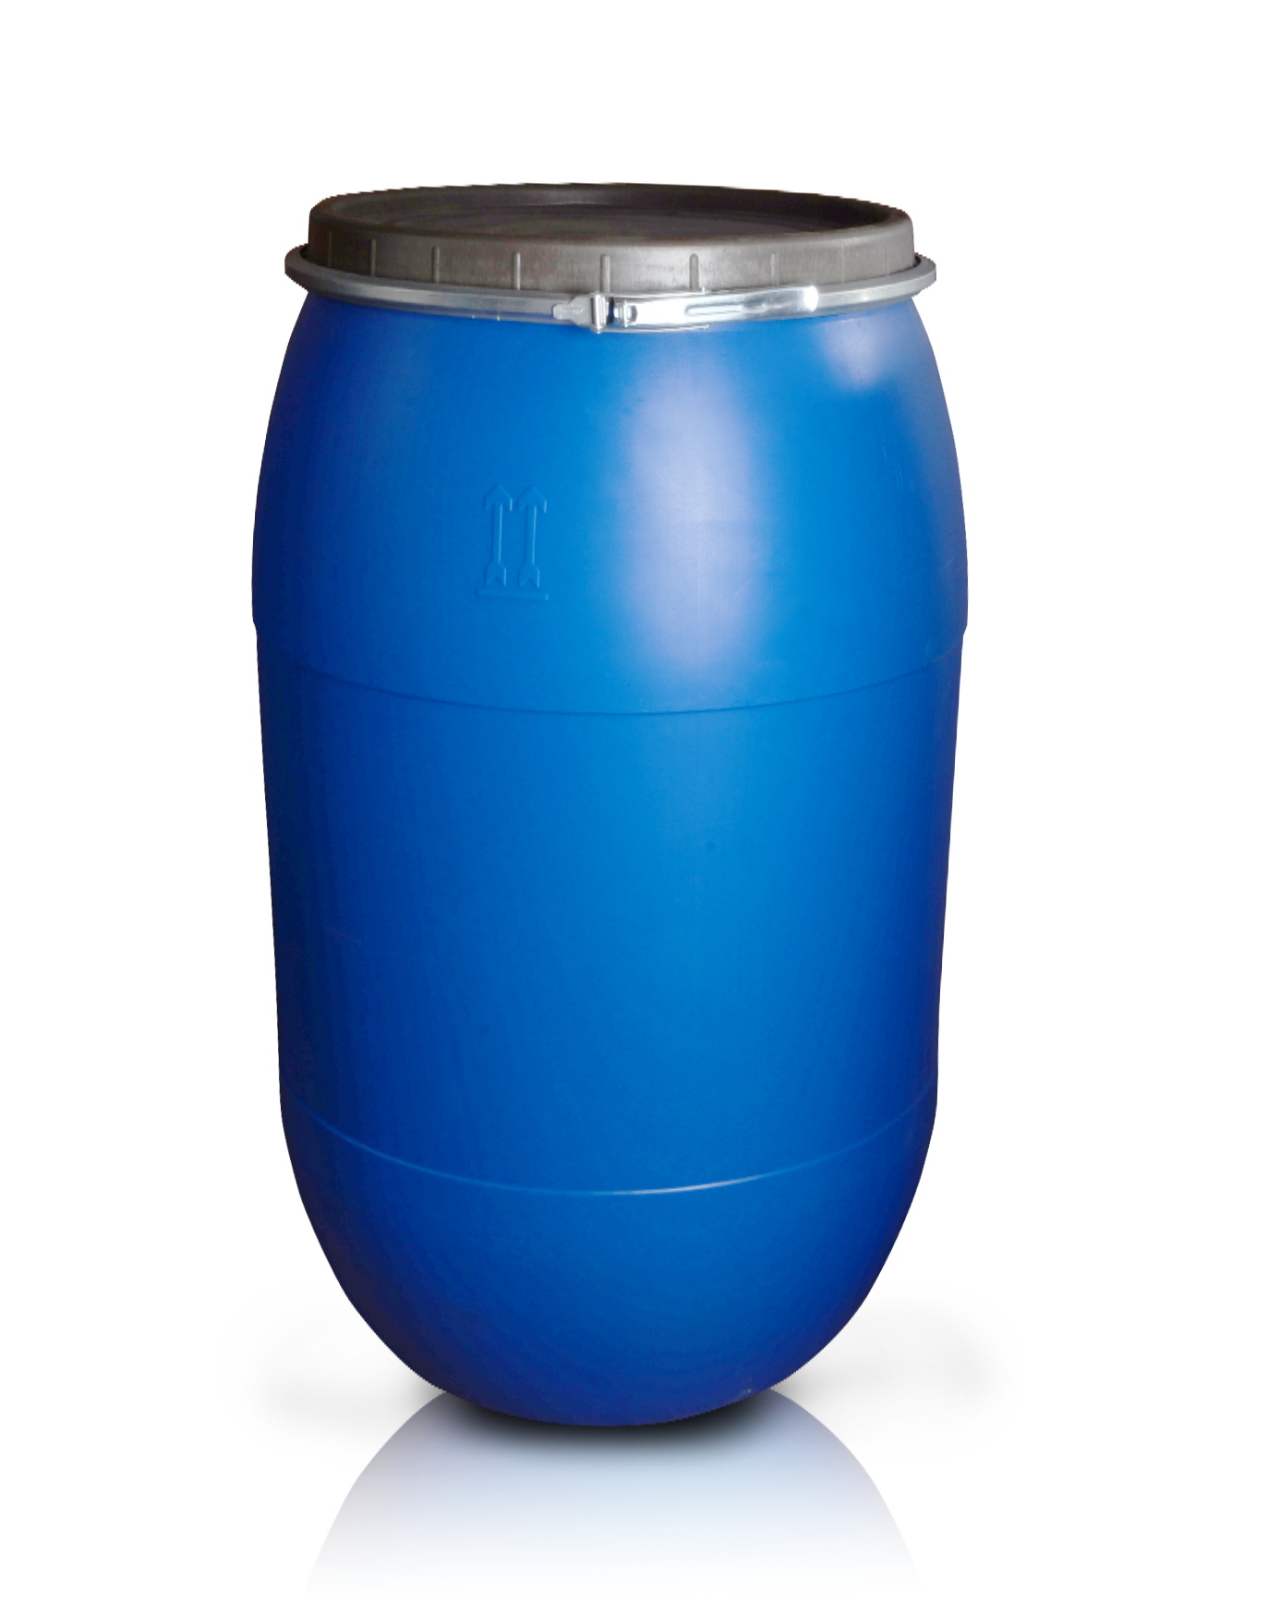 Plastic barrel 220L Clamp Ring Water Storage Container Drum Keg Screw Stock Tank